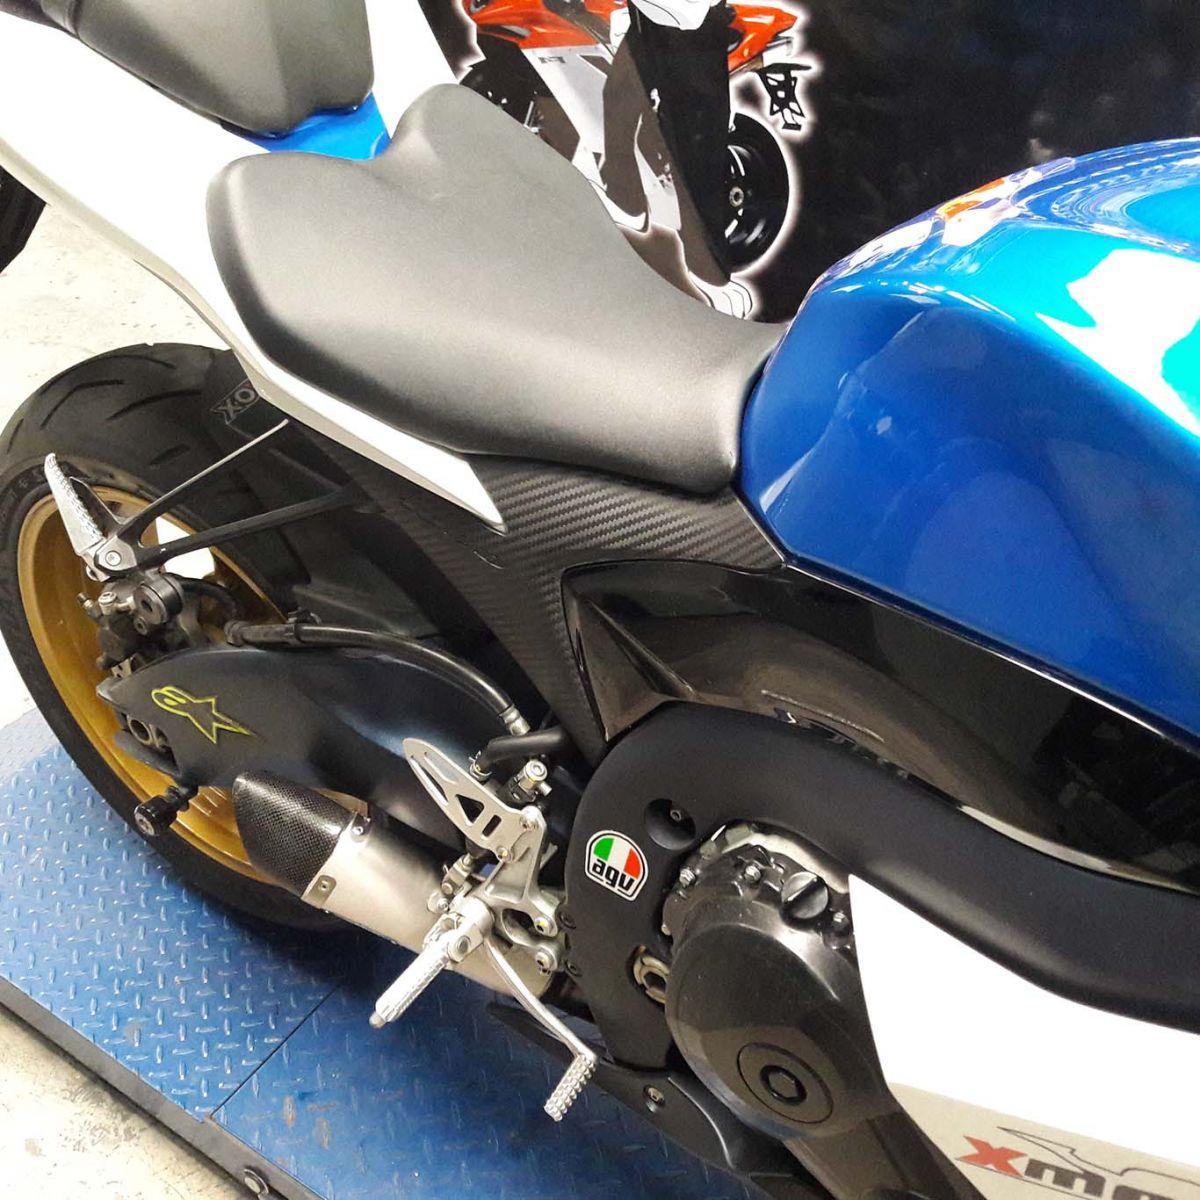 Ponteira Scorpion GP720 Inox p/ Suzuki SRAD GSXR 1000 11 a 13